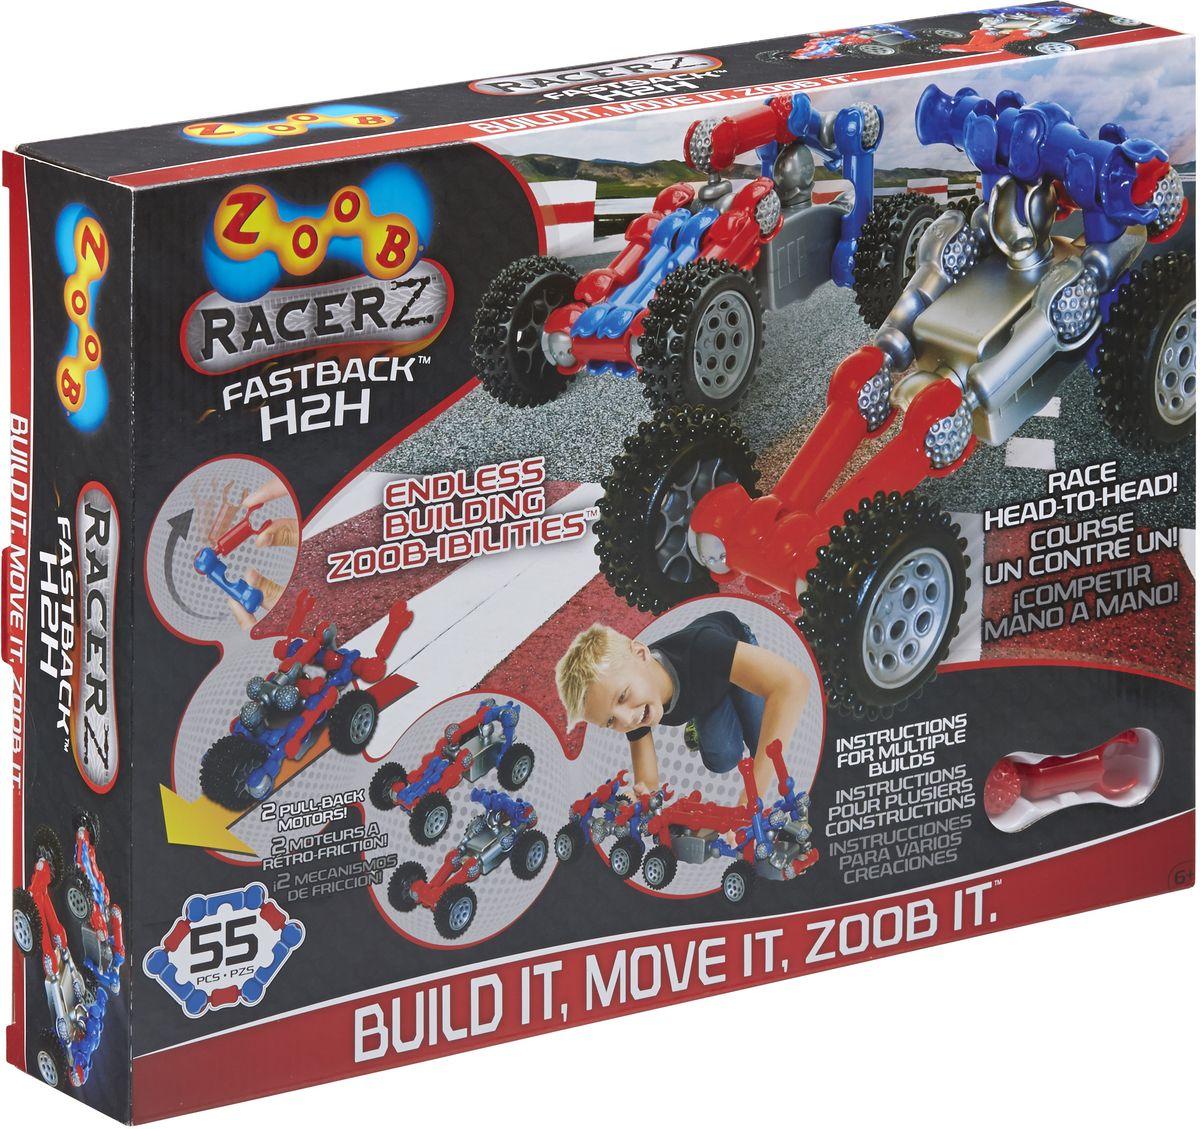 Zoob Racer Z Конструктор Fastback H2H